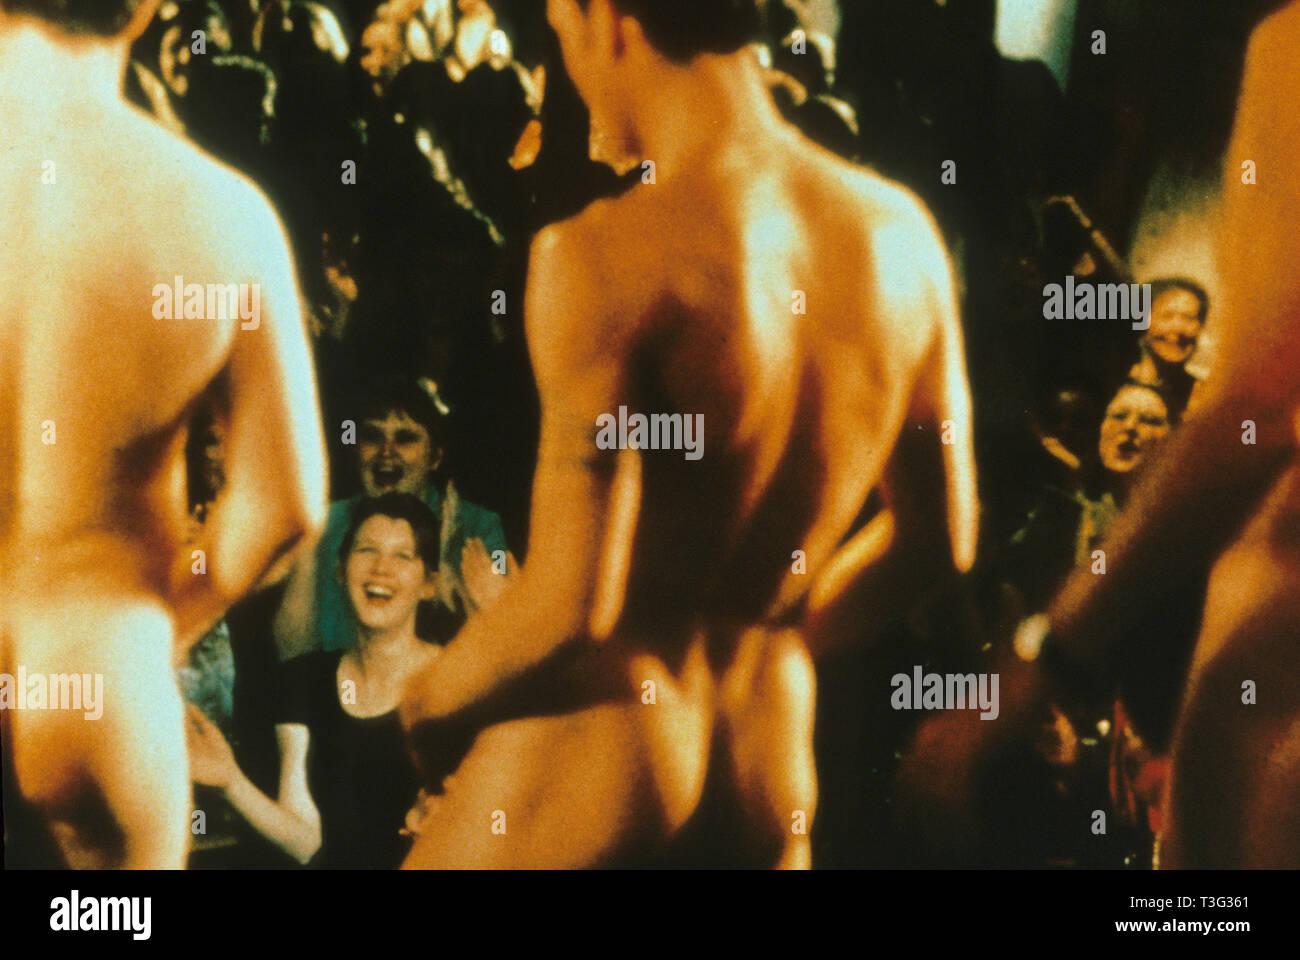 FULL MONTY 1997 Canal 4 film Imagen De Stock